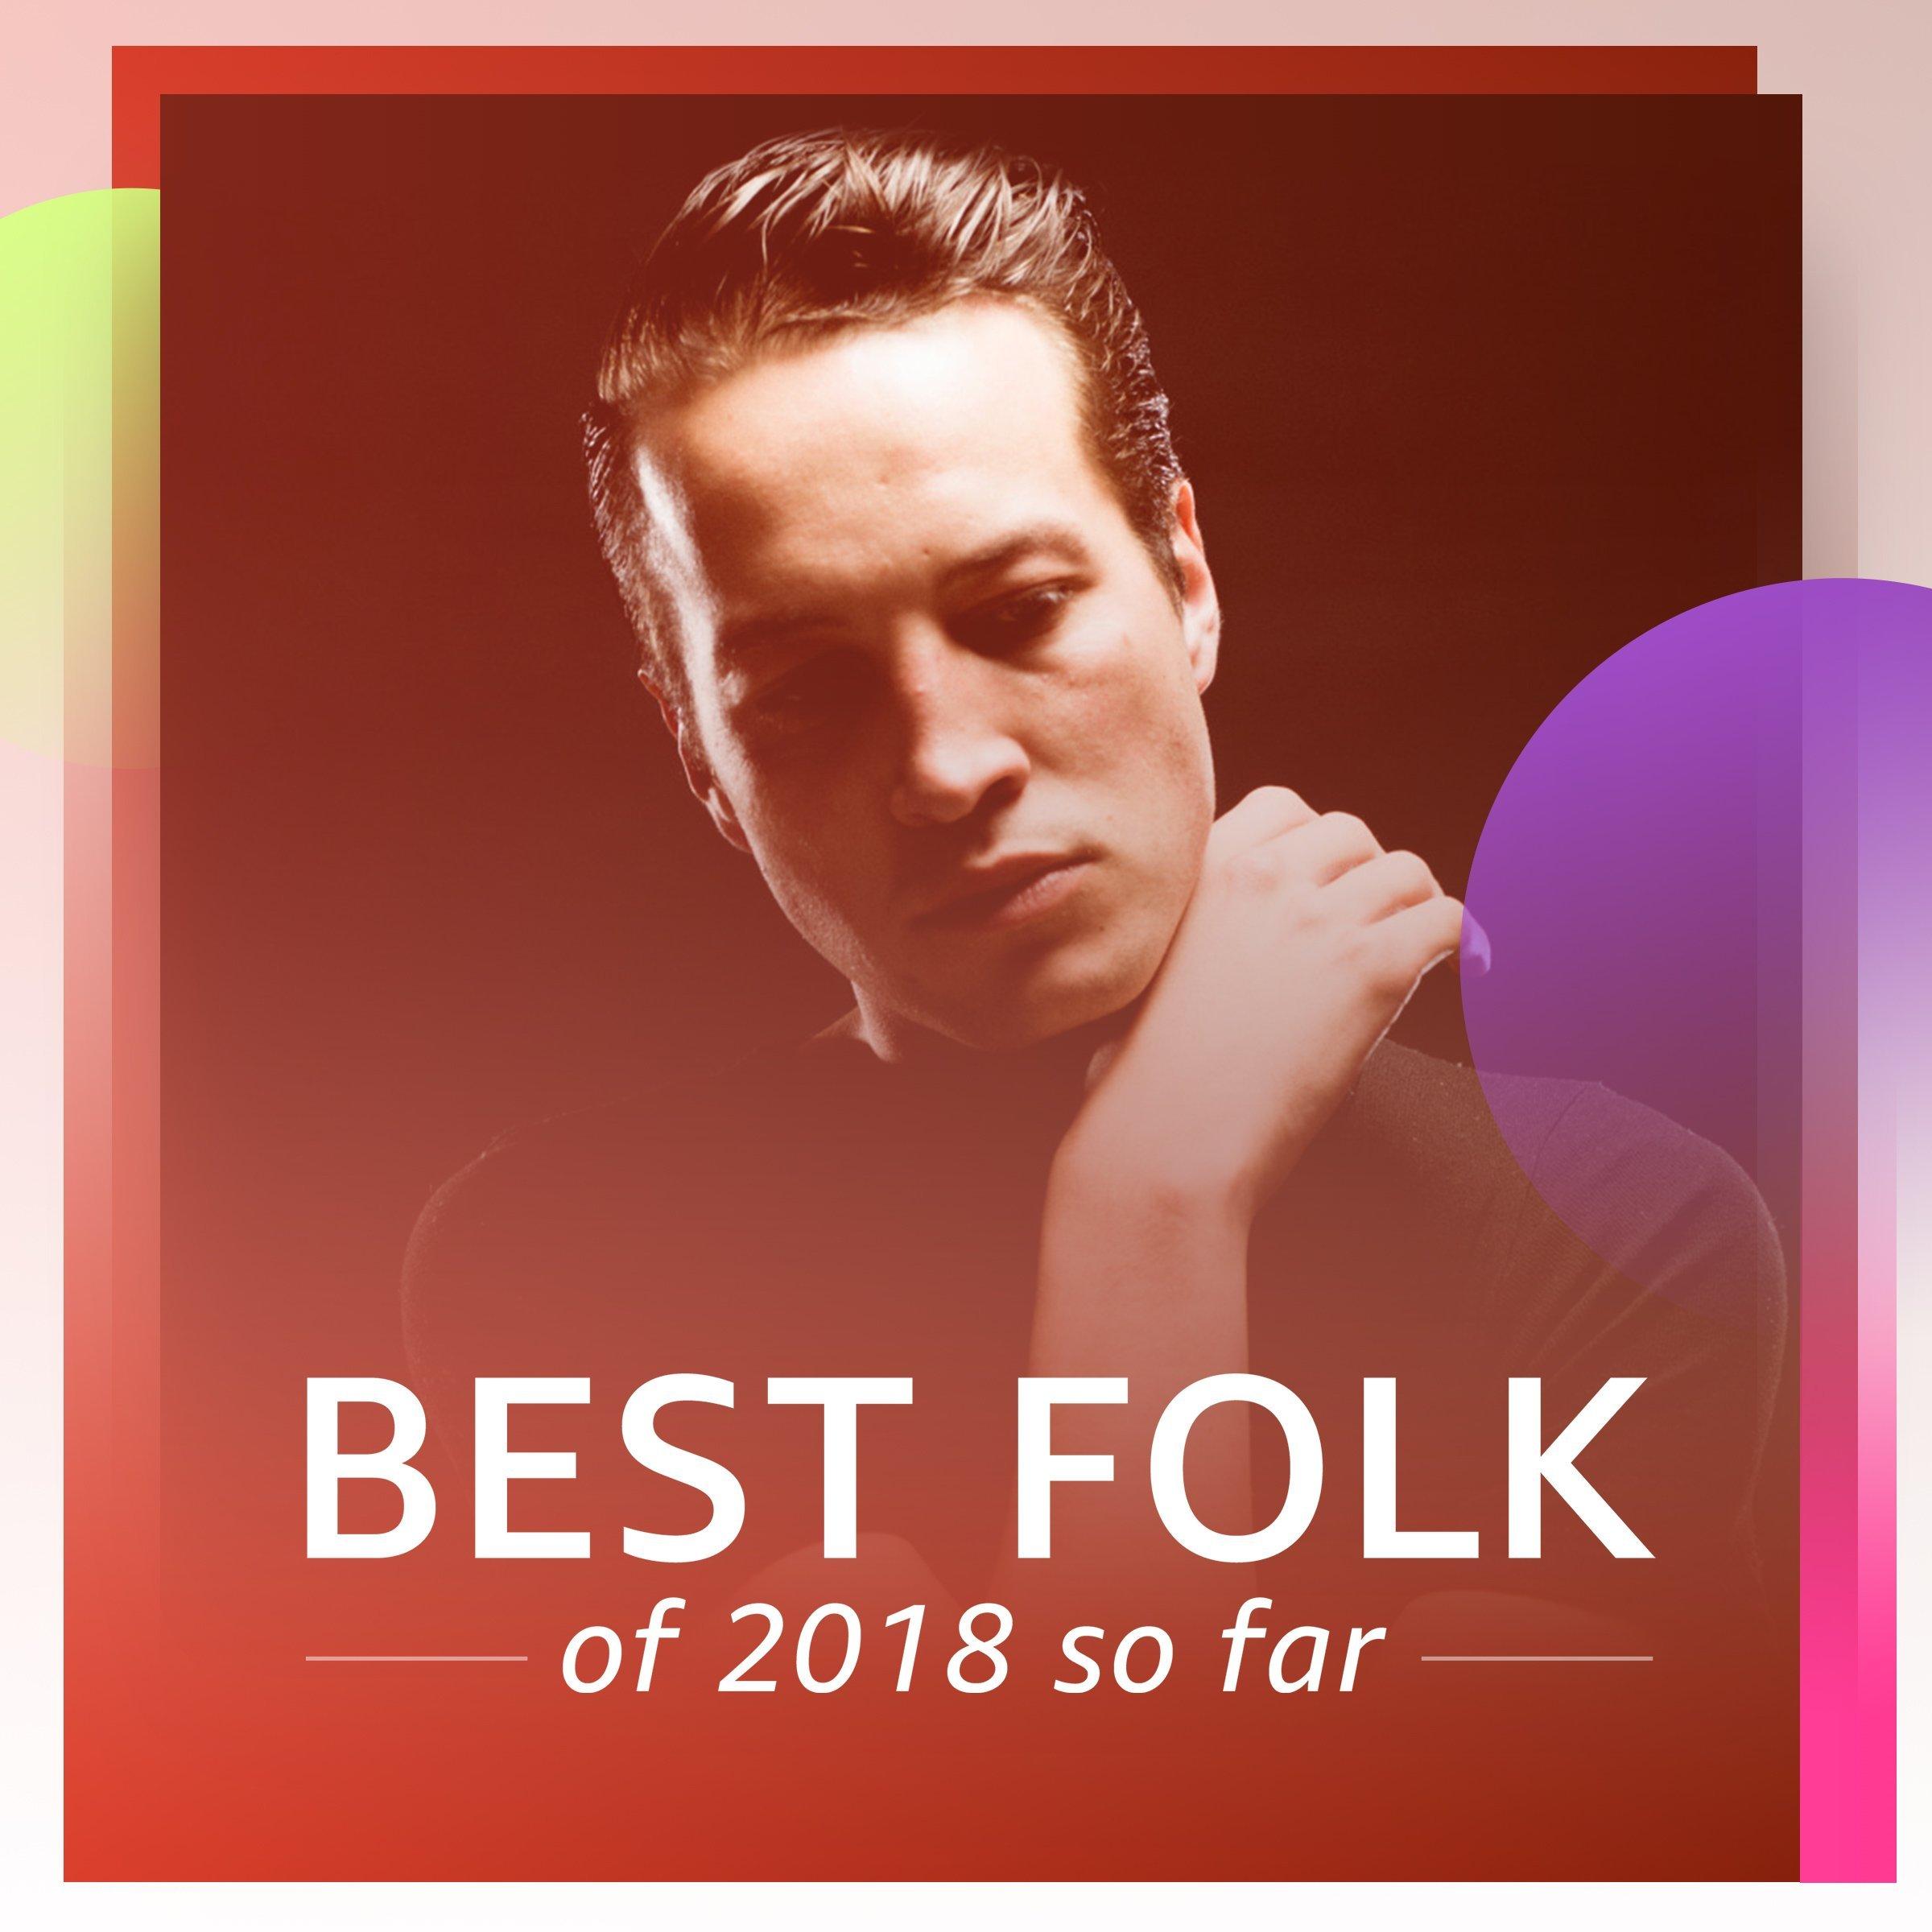 Best Folk of 2018 So Far